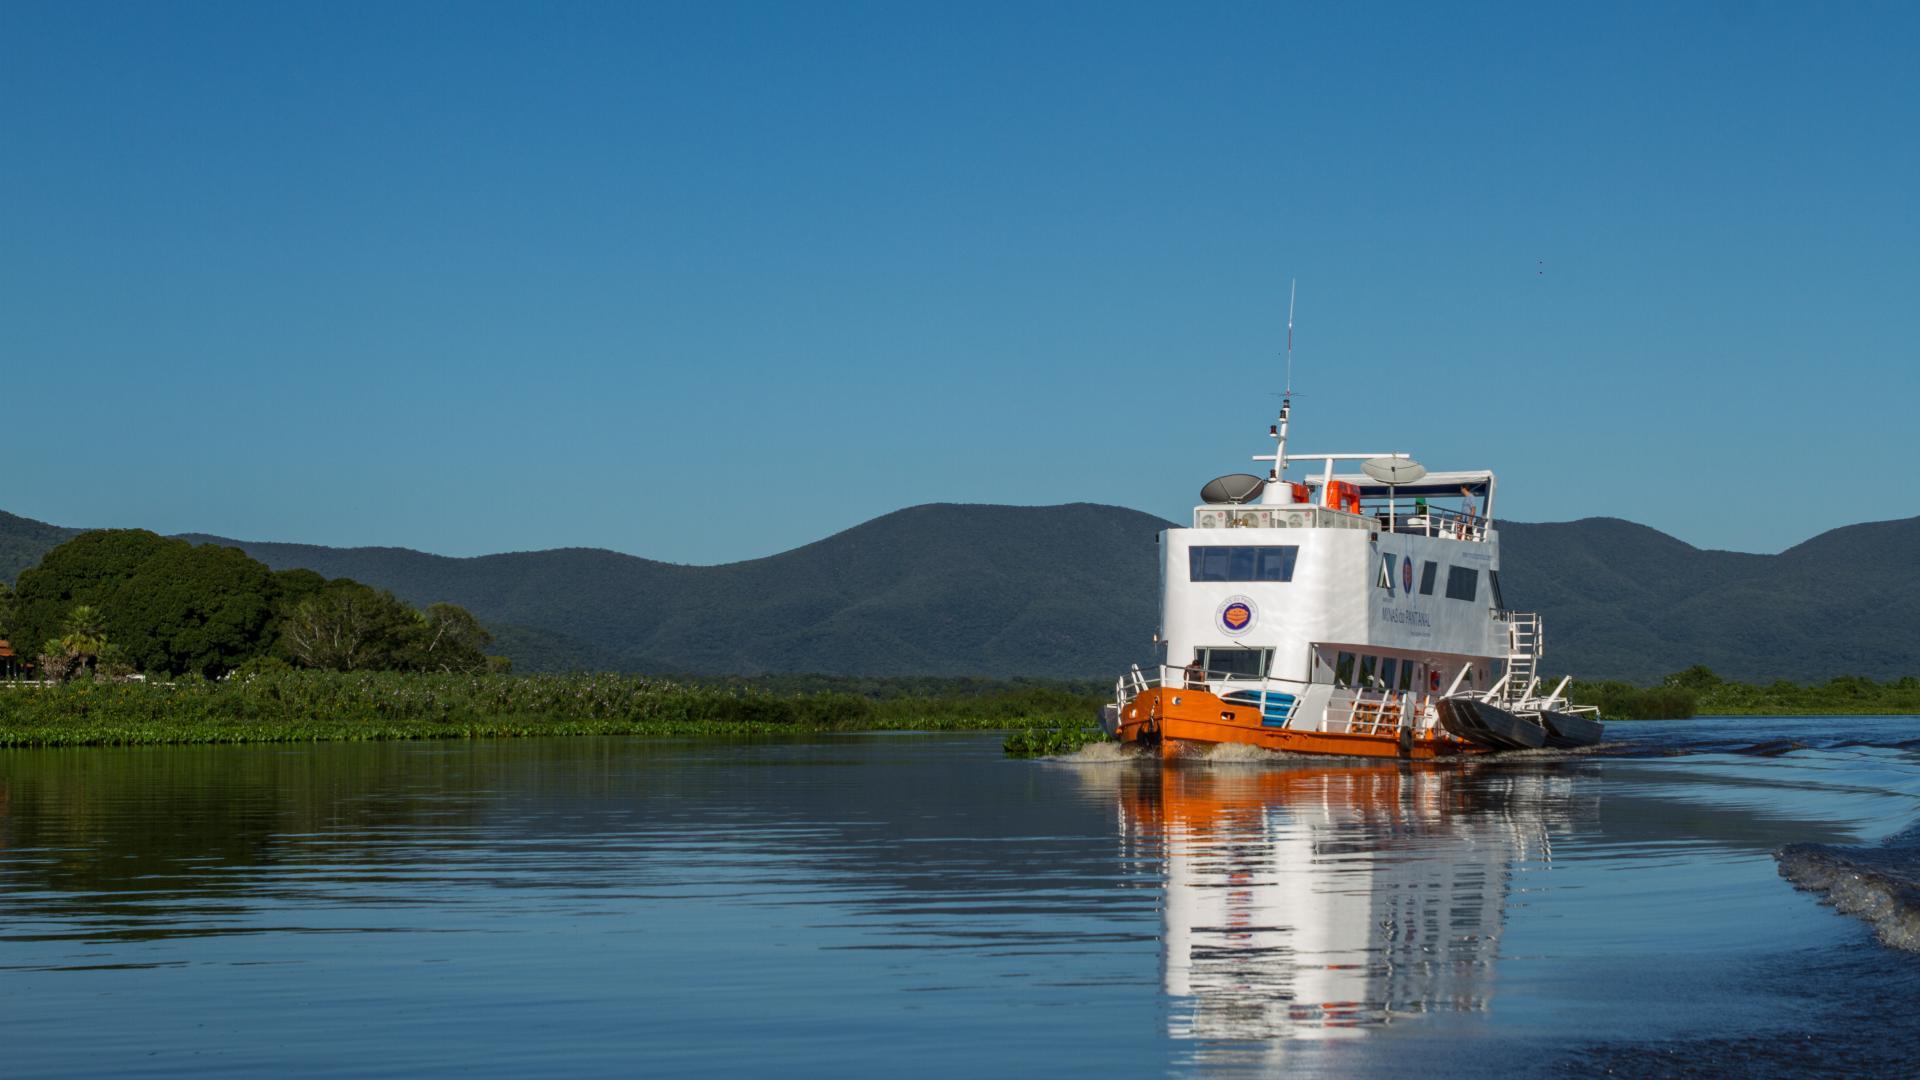 9 Tage Brasilien/ Nord Pantanal: Expeditionskreuzfahrt zur Jaguarbeobachtung, Schiff Minas do Pantanal